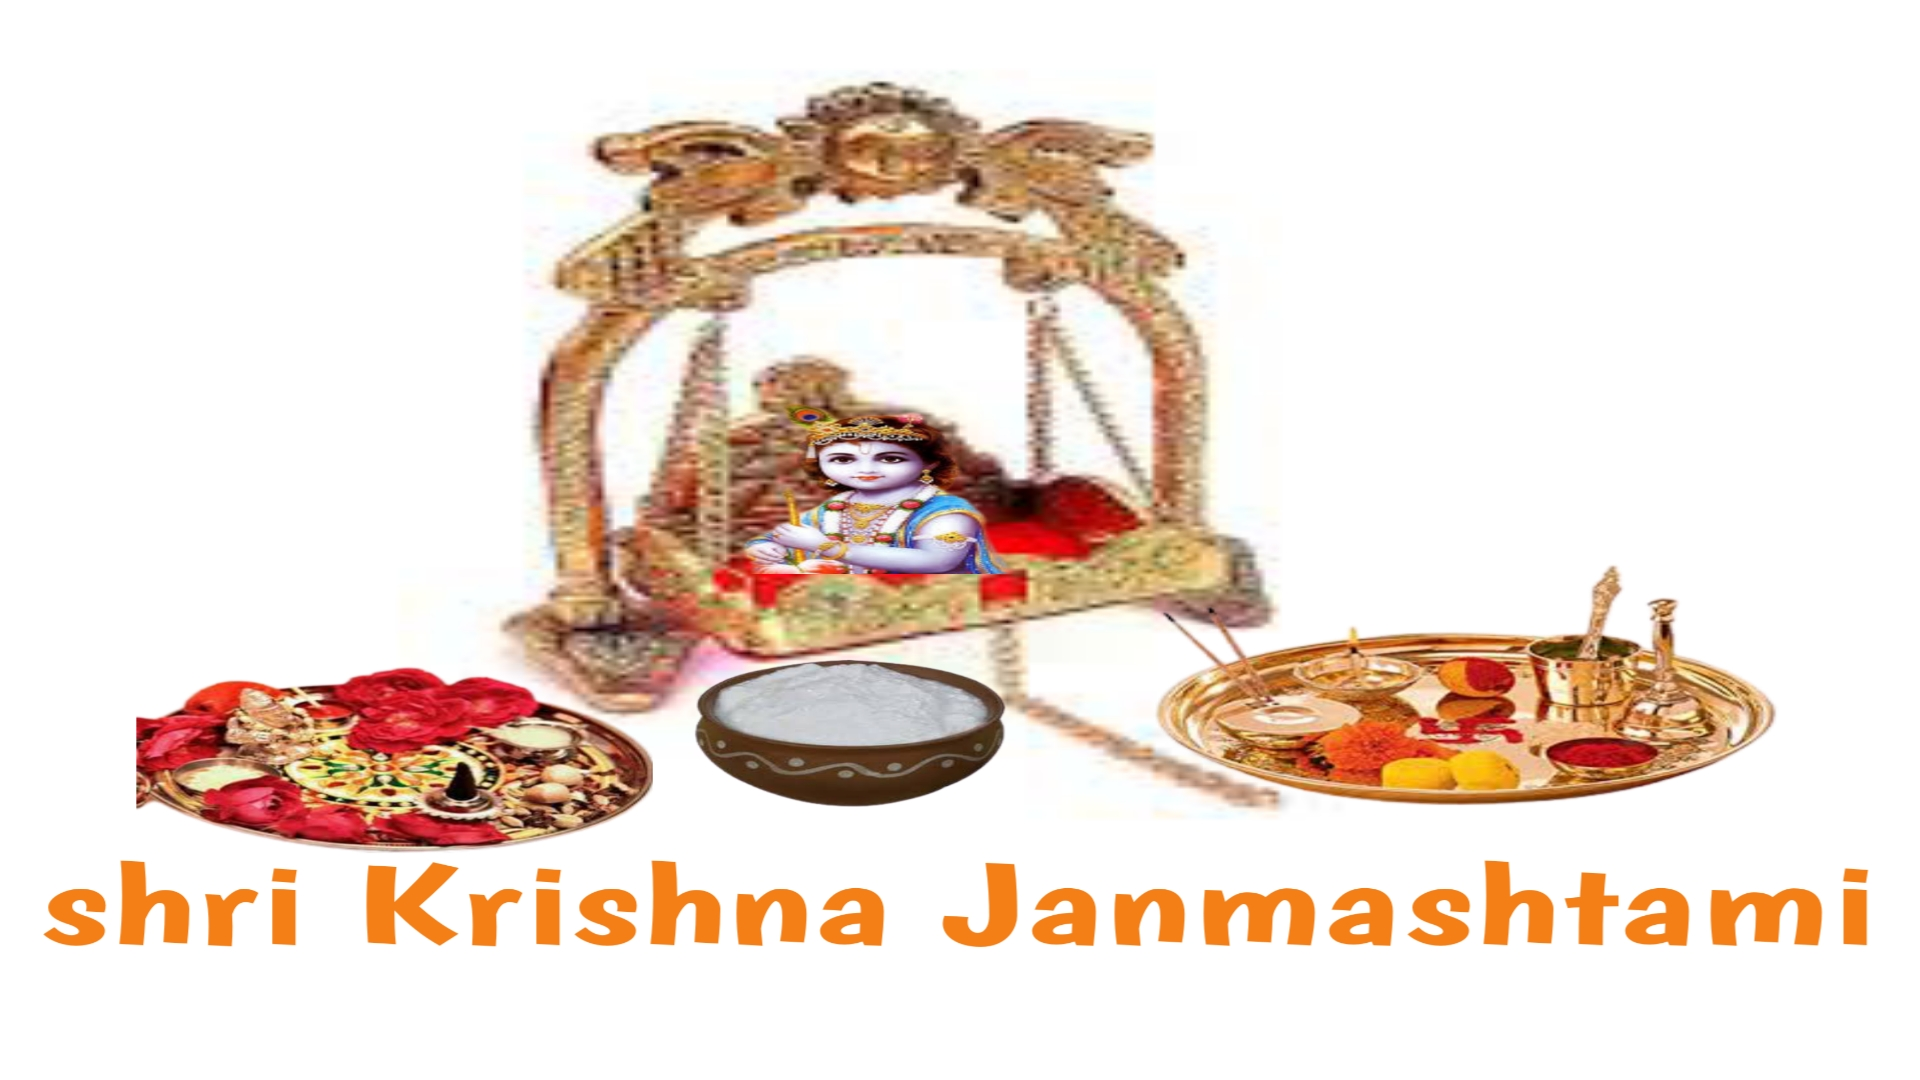 Krishna-krishna